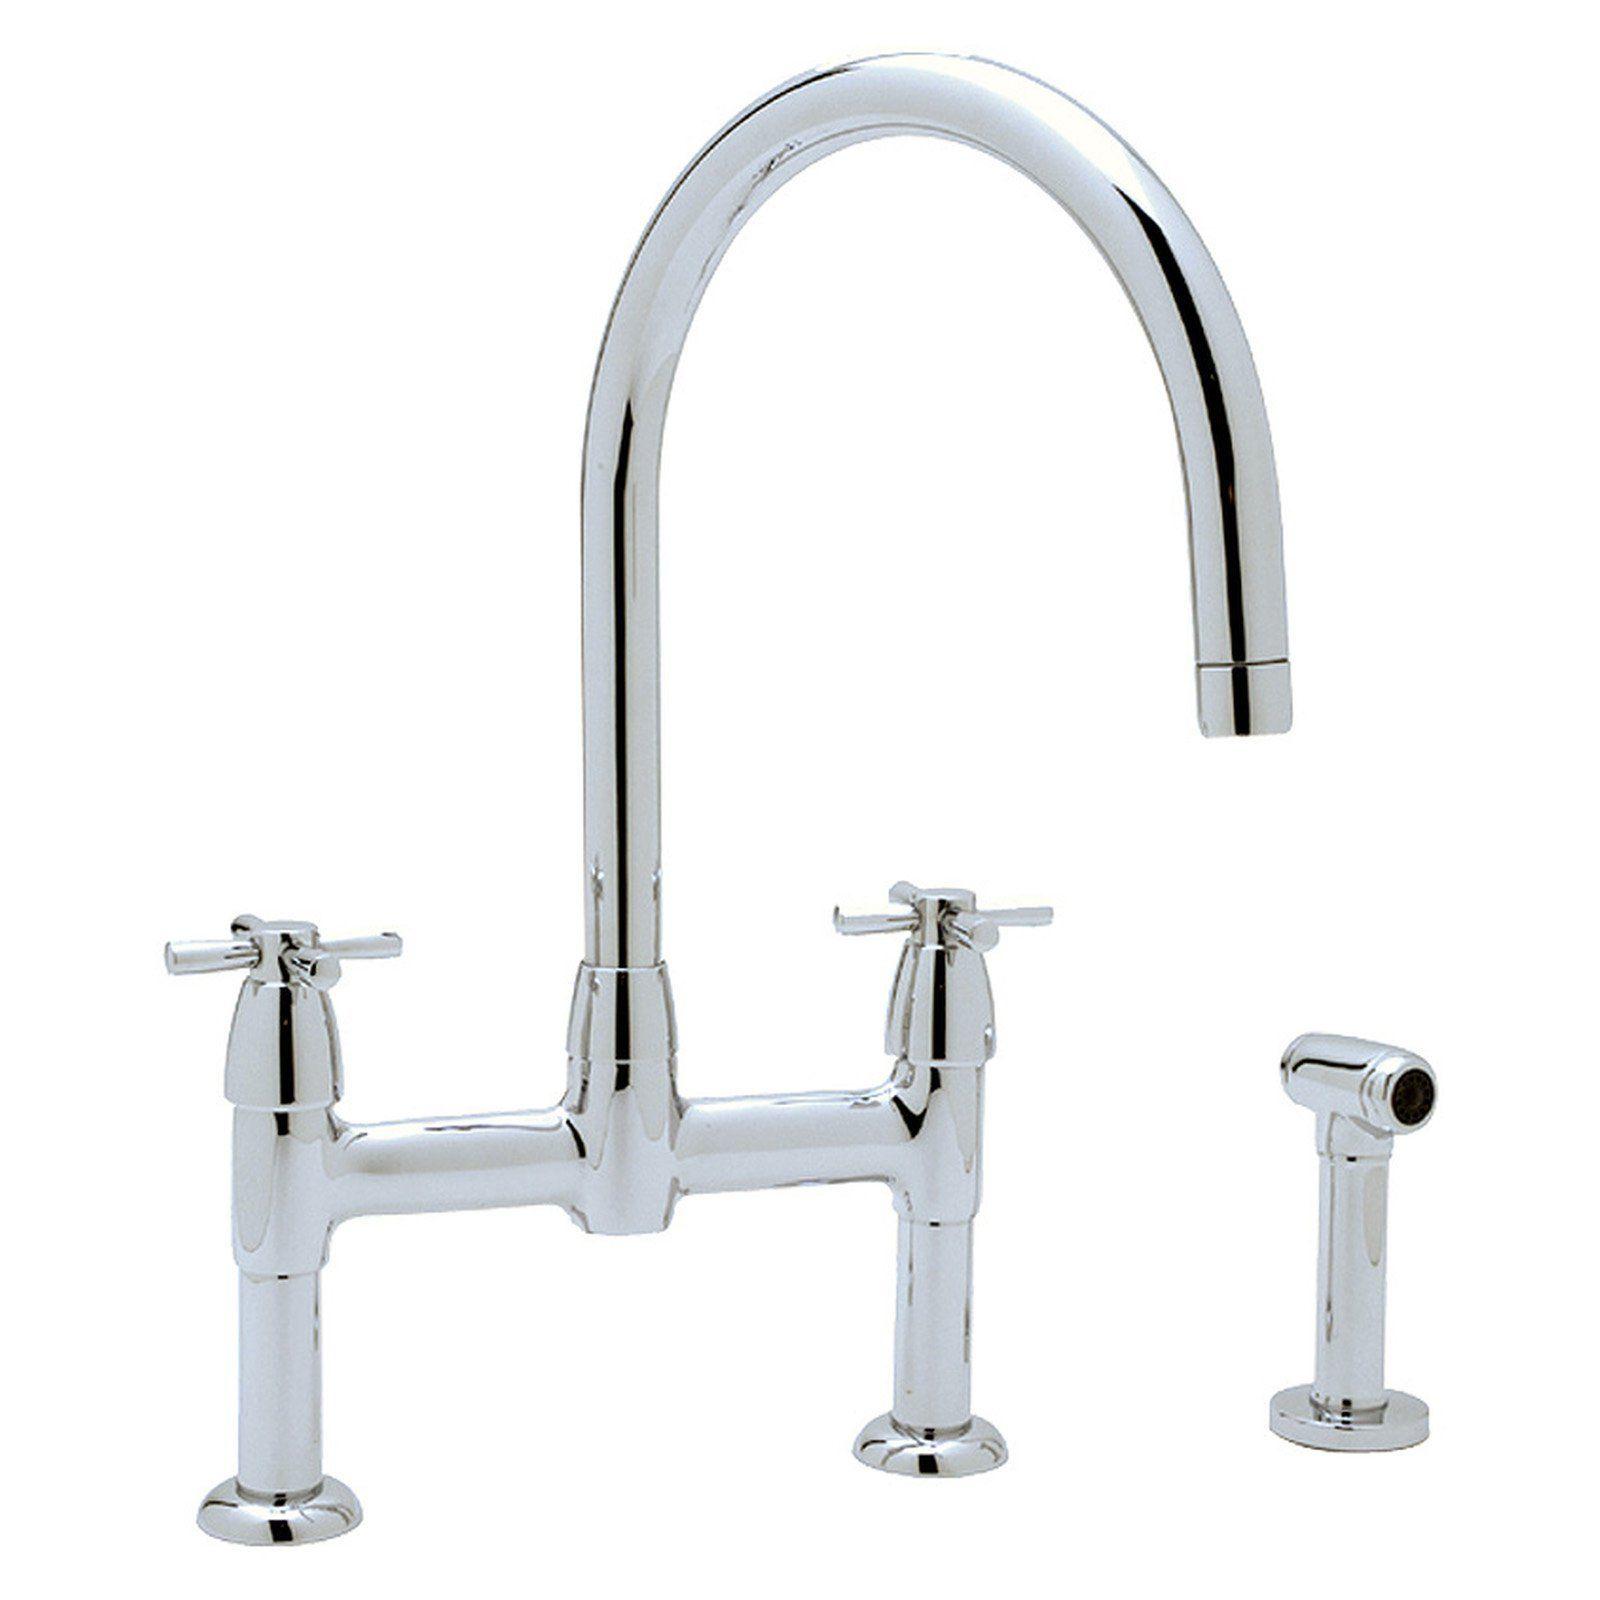 Rohl Perrin & Rowe U 4272X 2 Double Handle Kitchen Faucet U